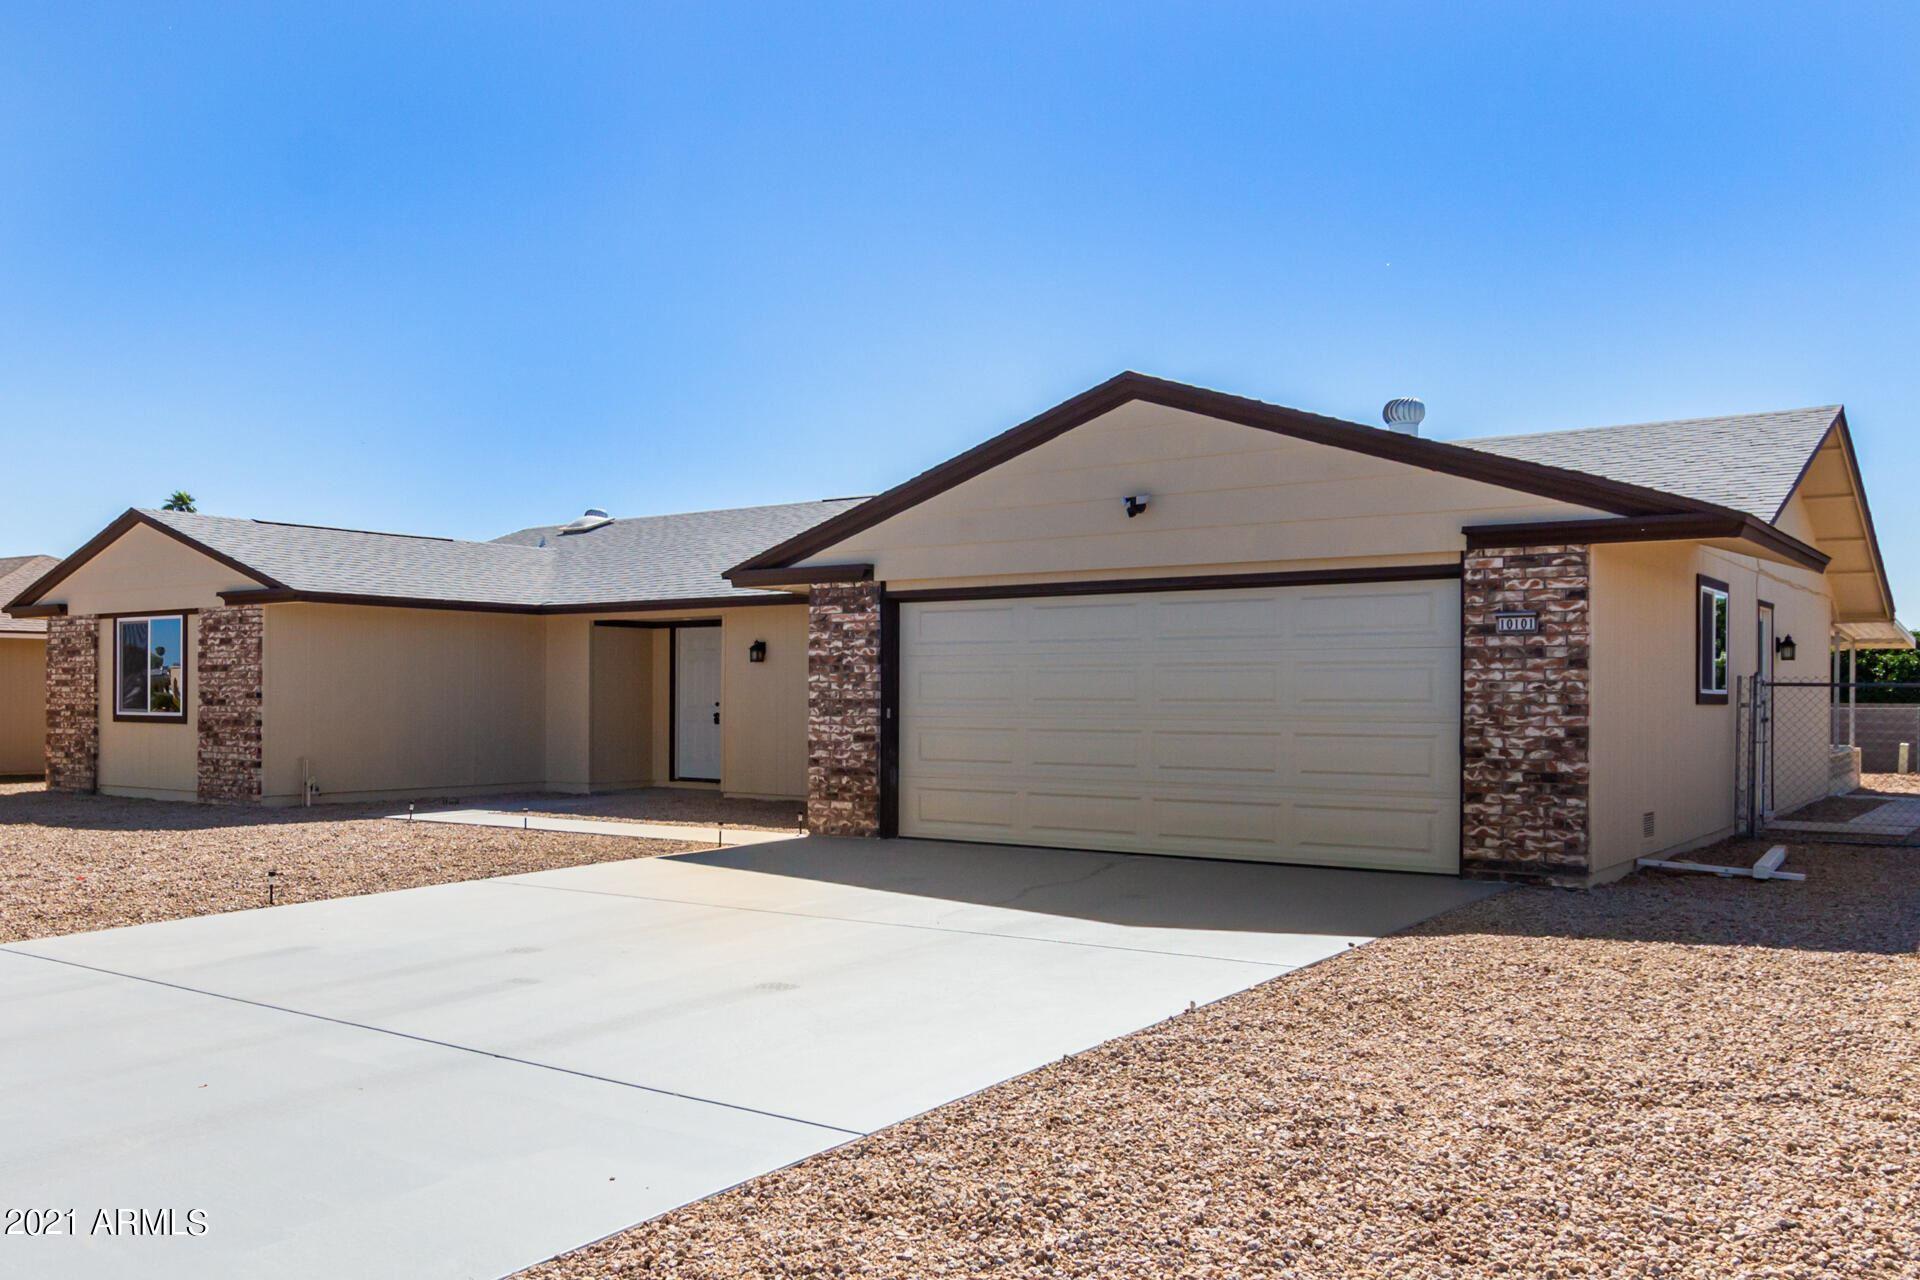 Photo of 10101 W BURNS Drive, Sun City, AZ 85351 (MLS # 6307517)